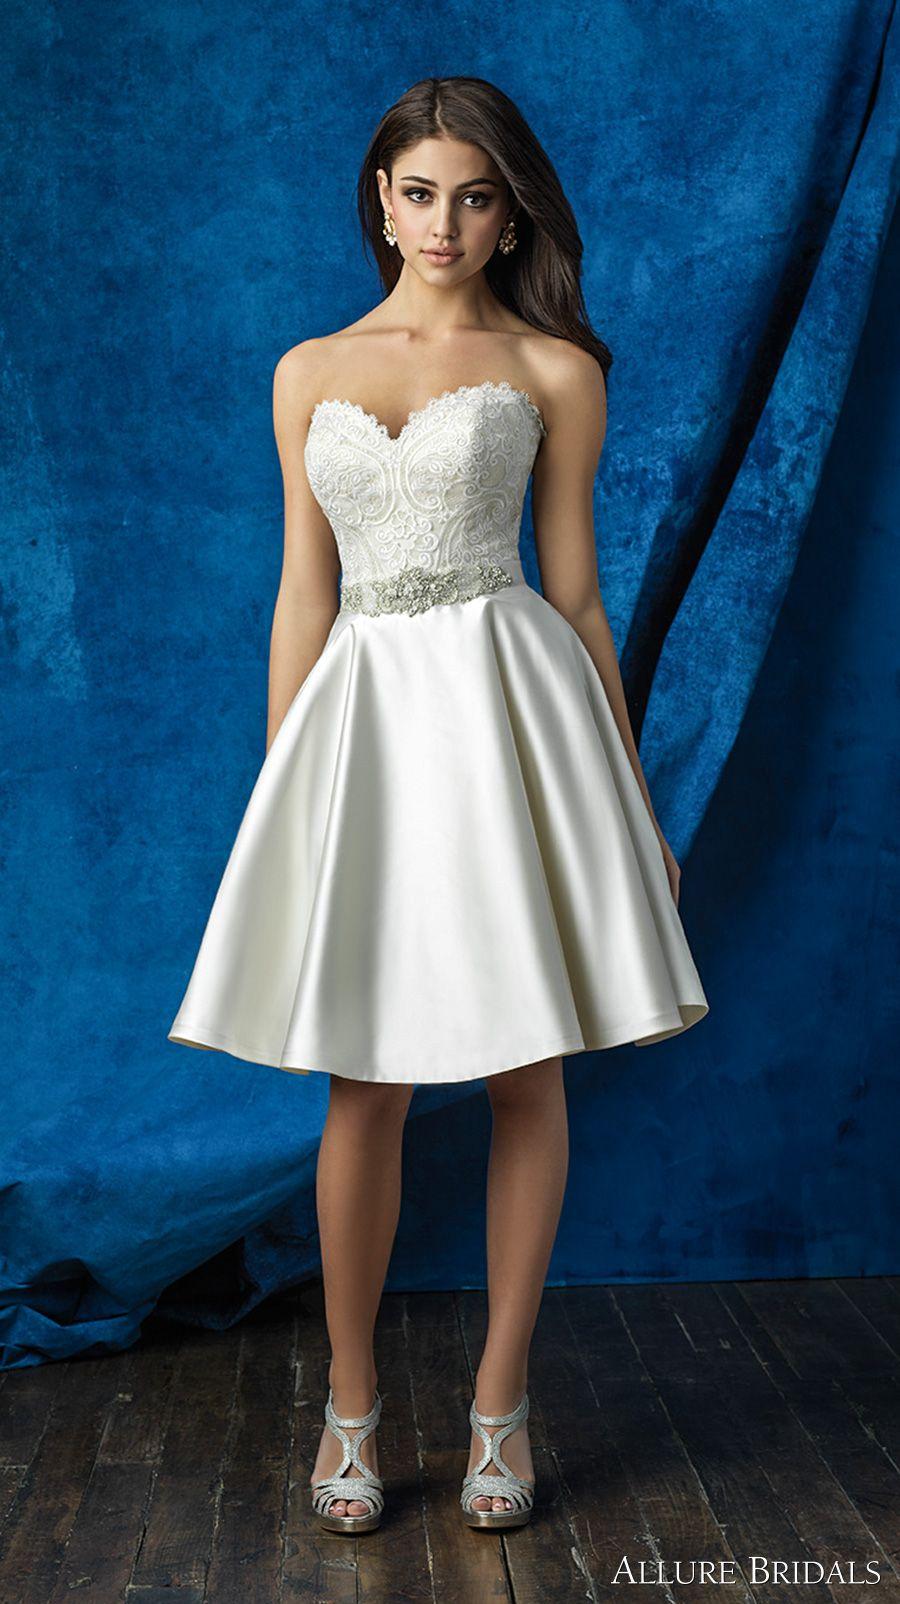 Allure Bridals 2016 Mix Match Strapless Scallop Sweetheart Neckline Heavily Embellished Bodice Satin Short Skirt Knee Length Wedding Dress A2001 Top